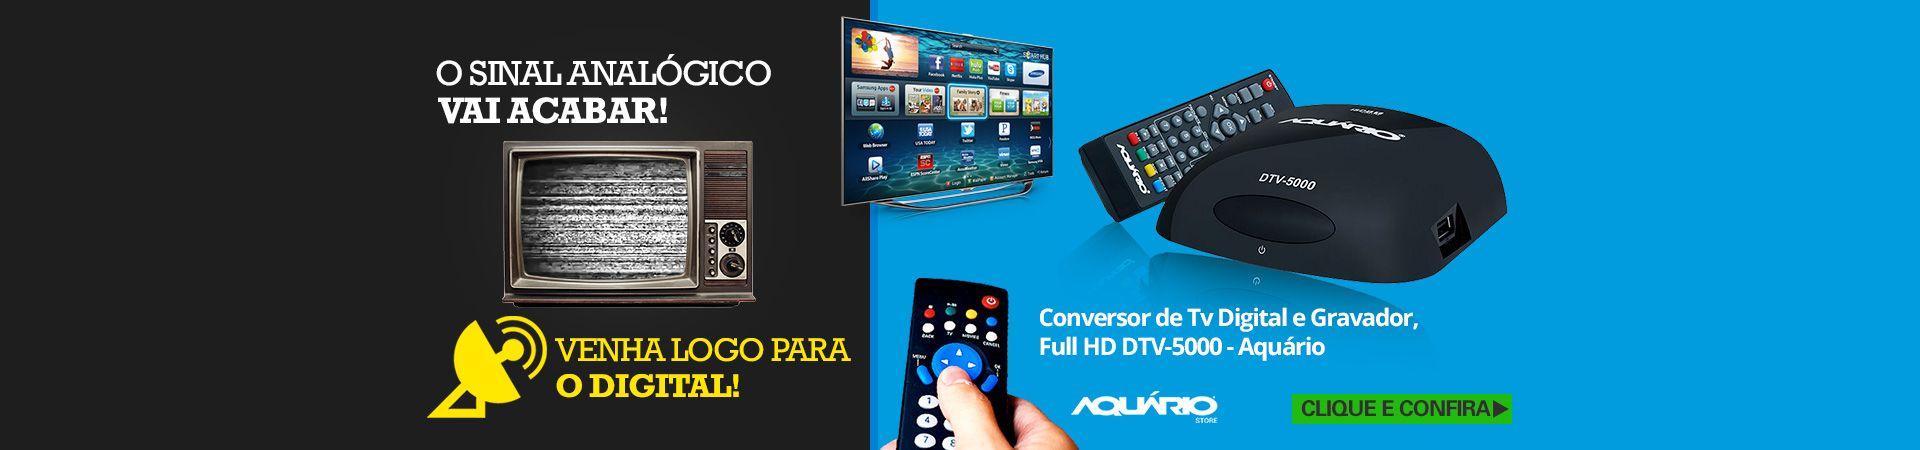 DTV-5000